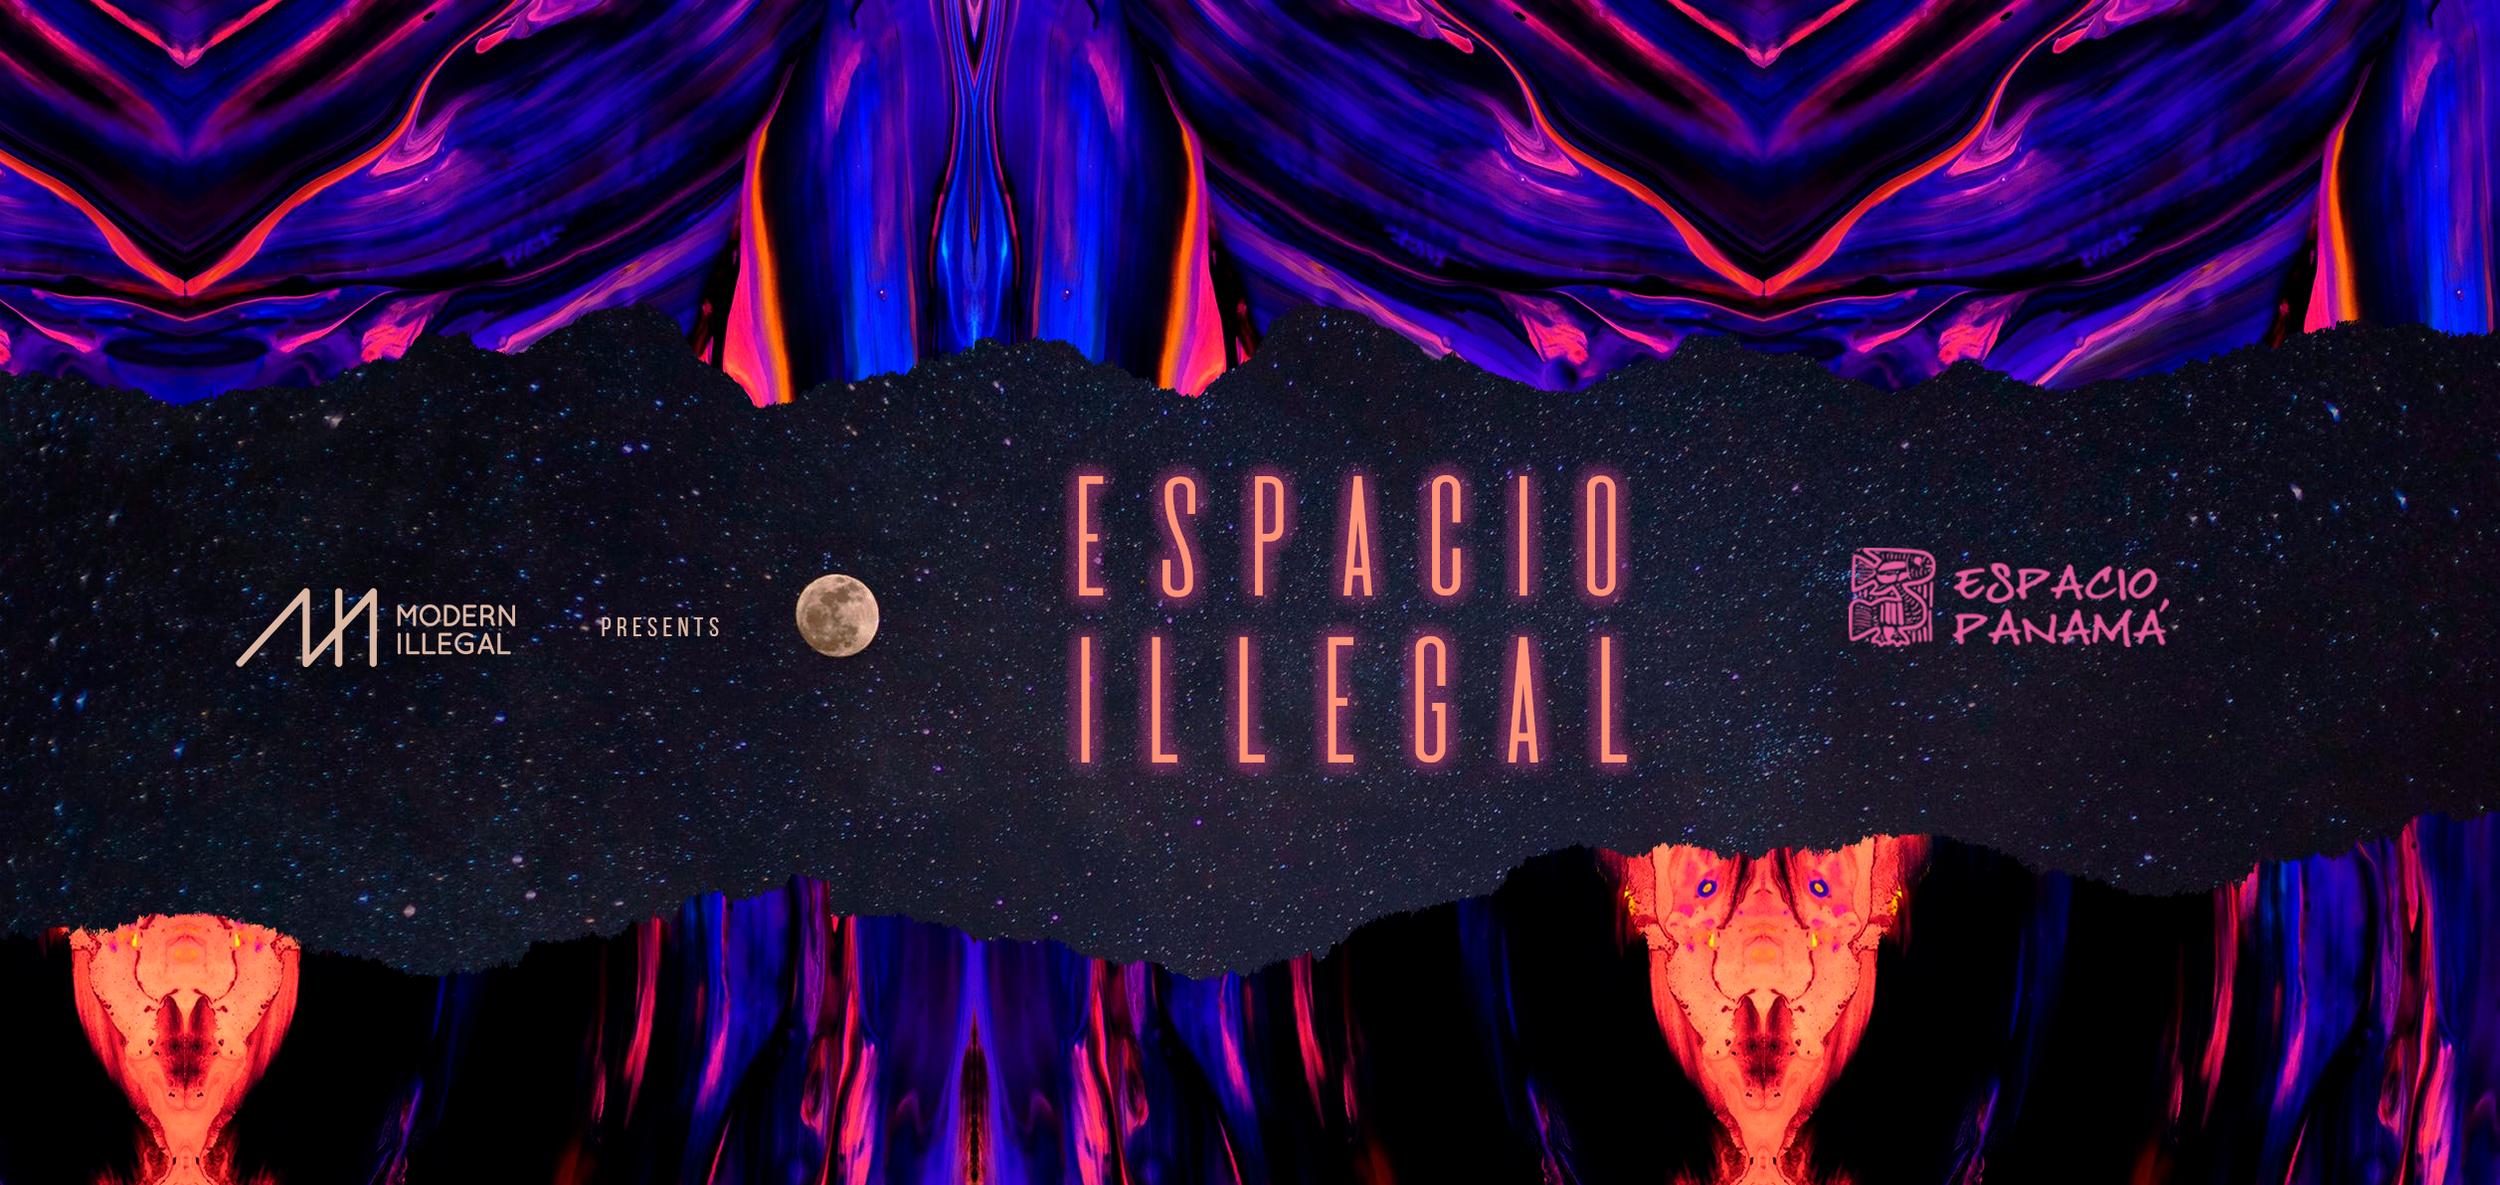 espacio_Illegal_cover_march.png